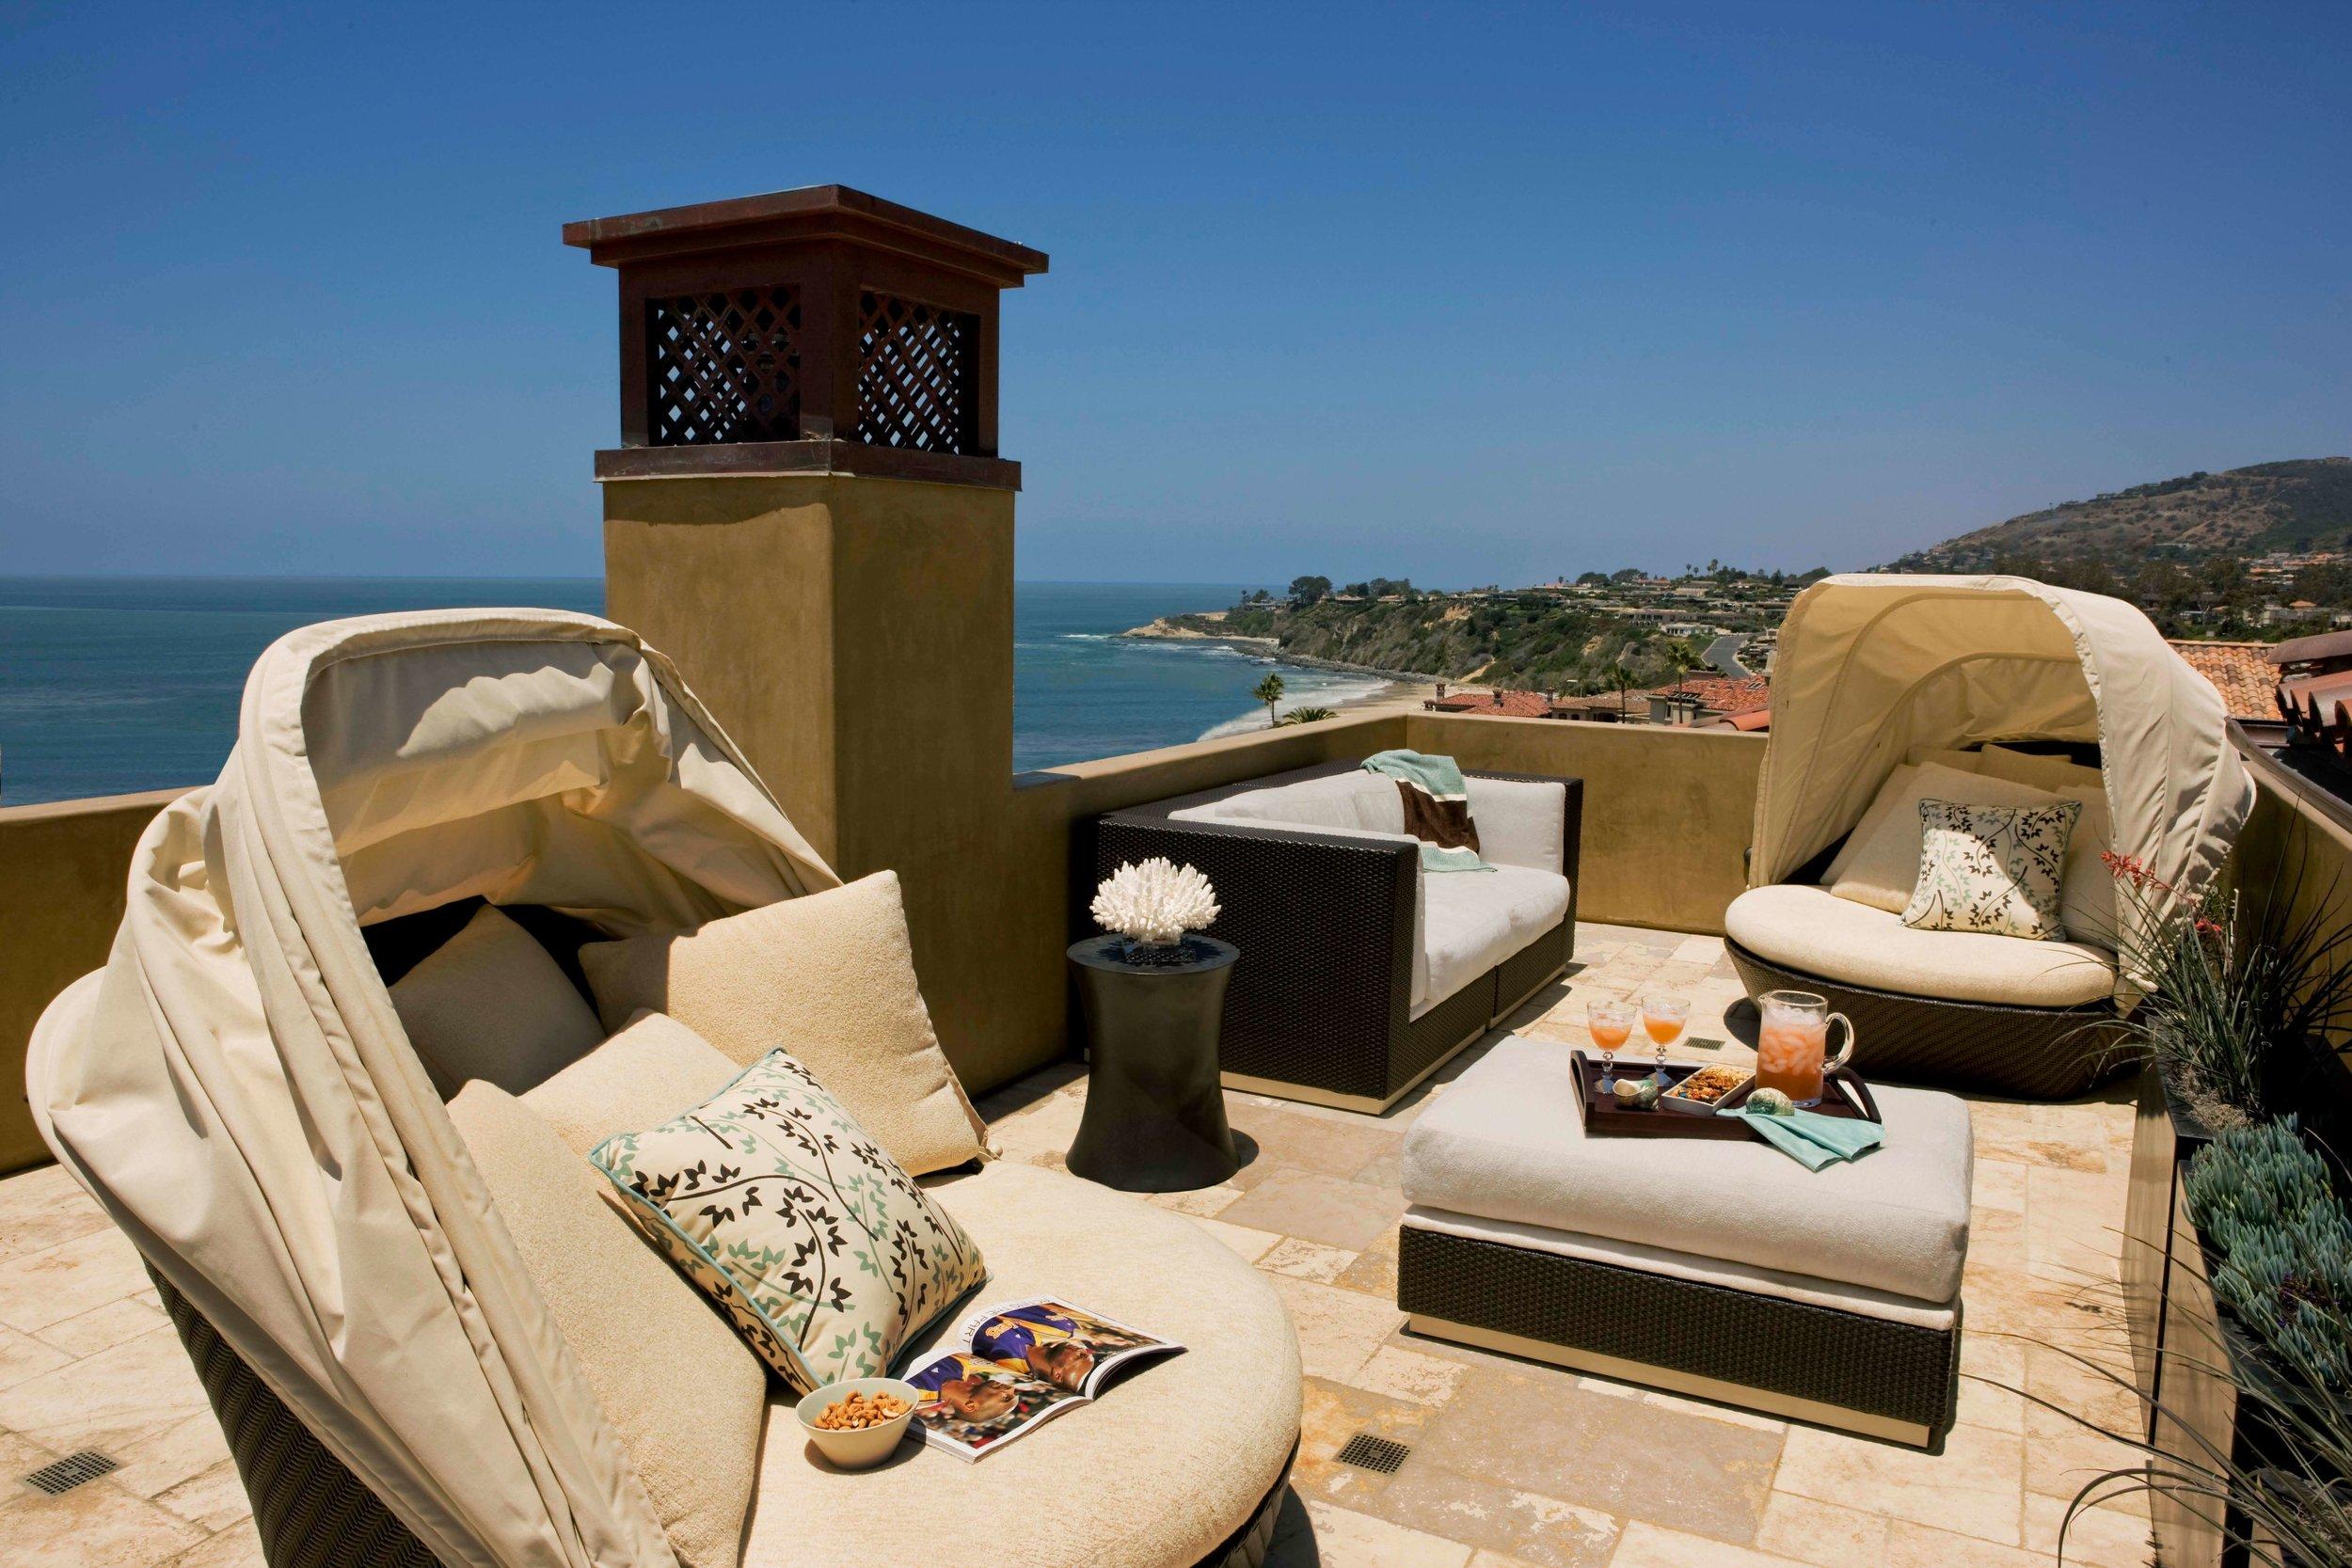 elizabeth-tapper-interiors-ritz-cove-laguna-exterior-outdoor-lounge-oceanfront-deck-view.jpg